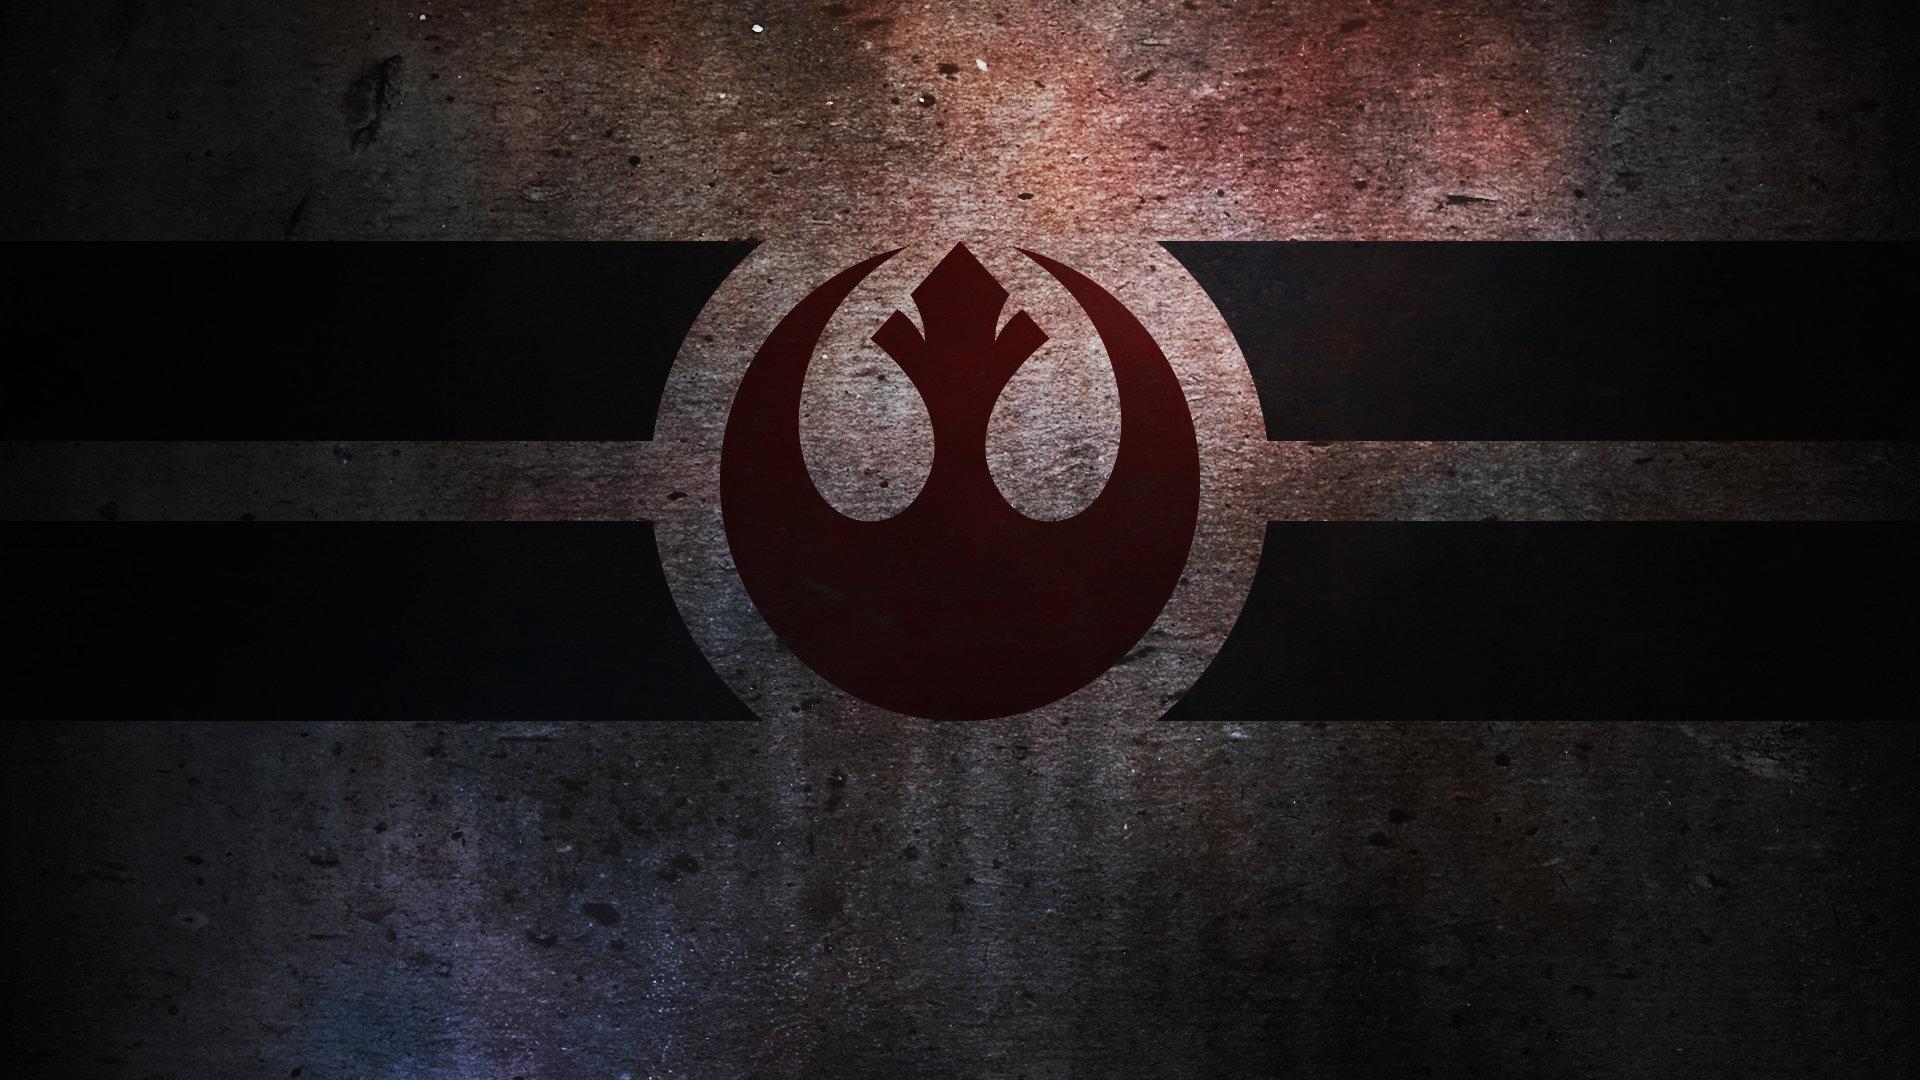 star wars wallpapers 1920x1080